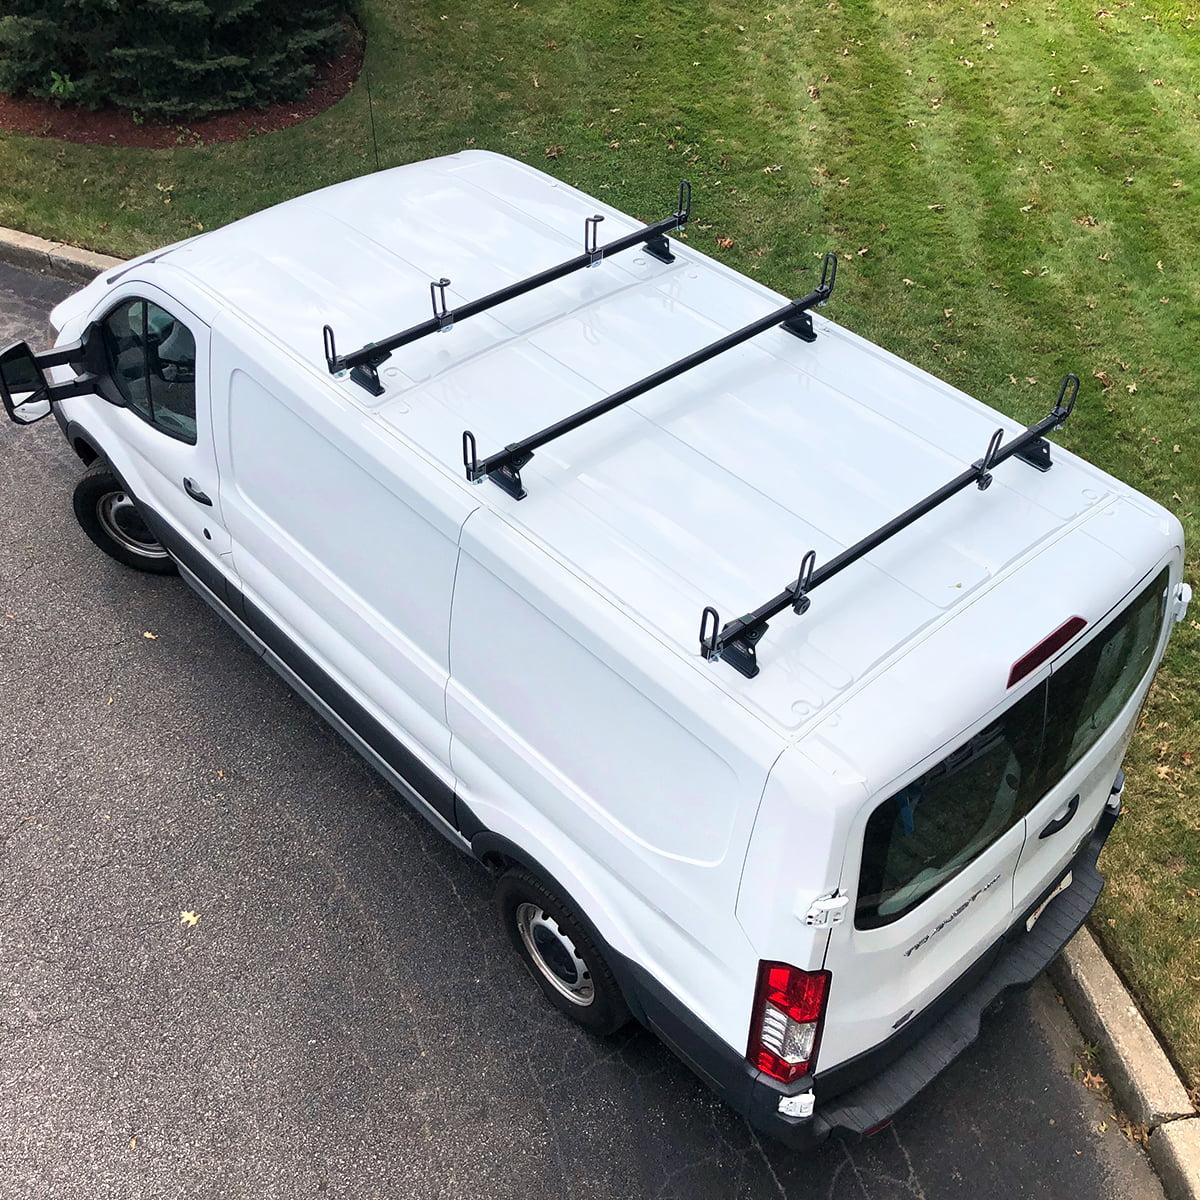 vantech heavy duty 3 bar ladder roof rack fits transit cargo van low roof black walmart com